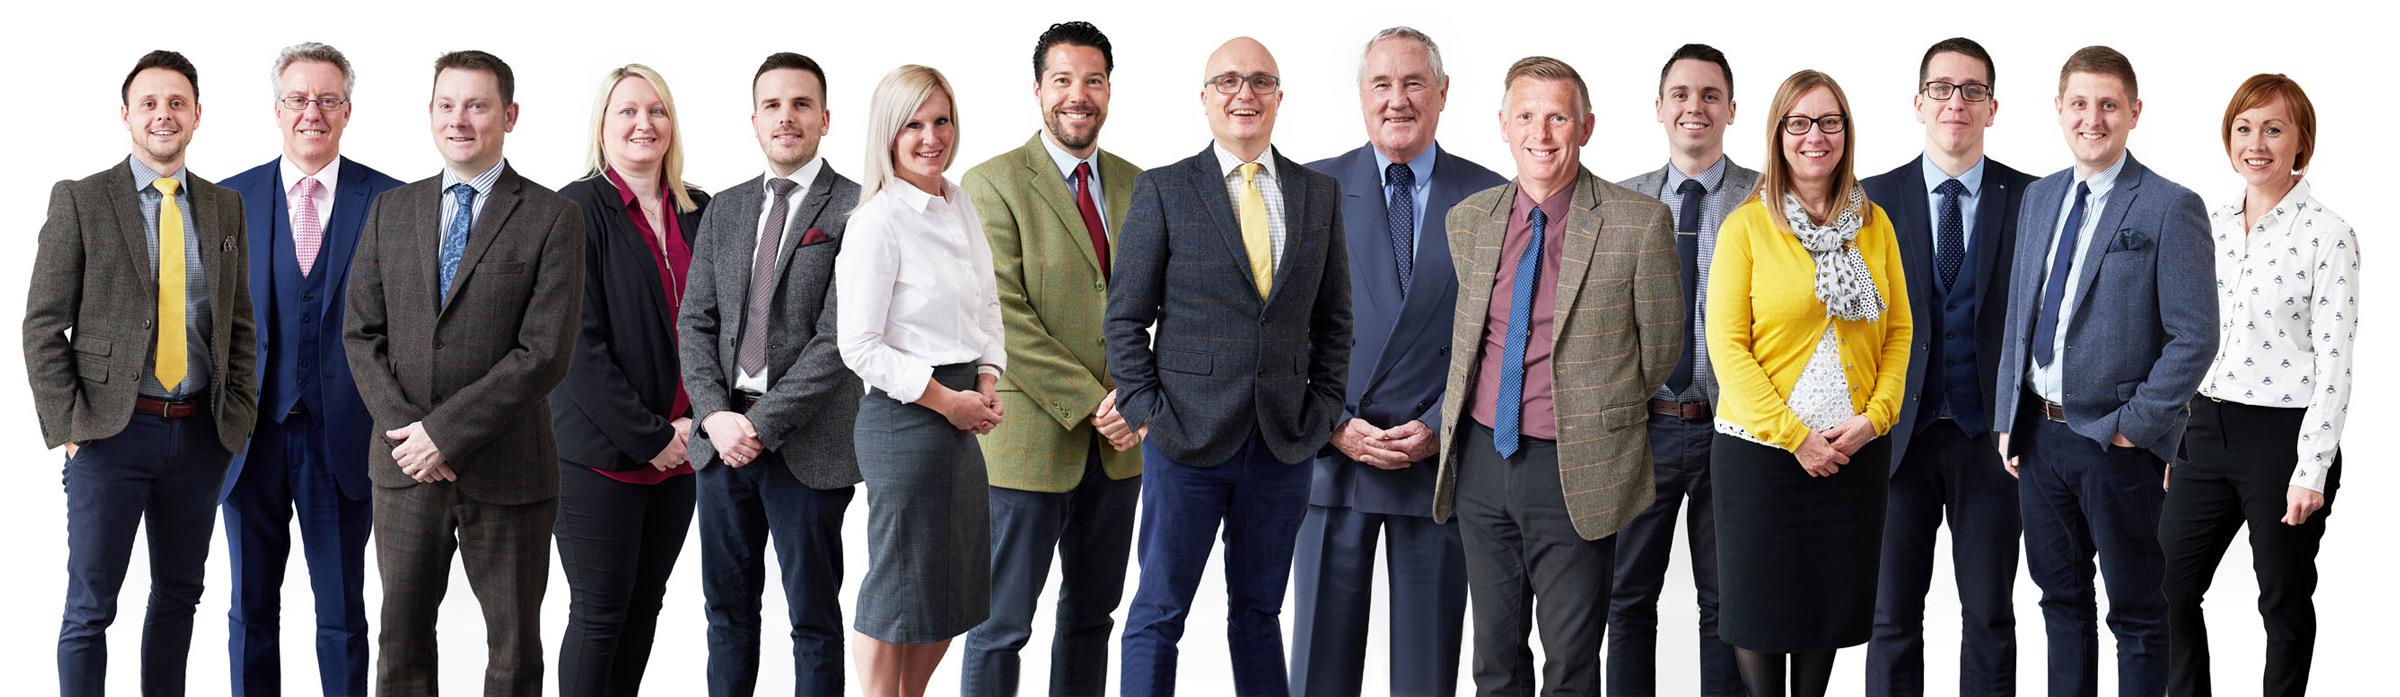 Broadland Consultants Team